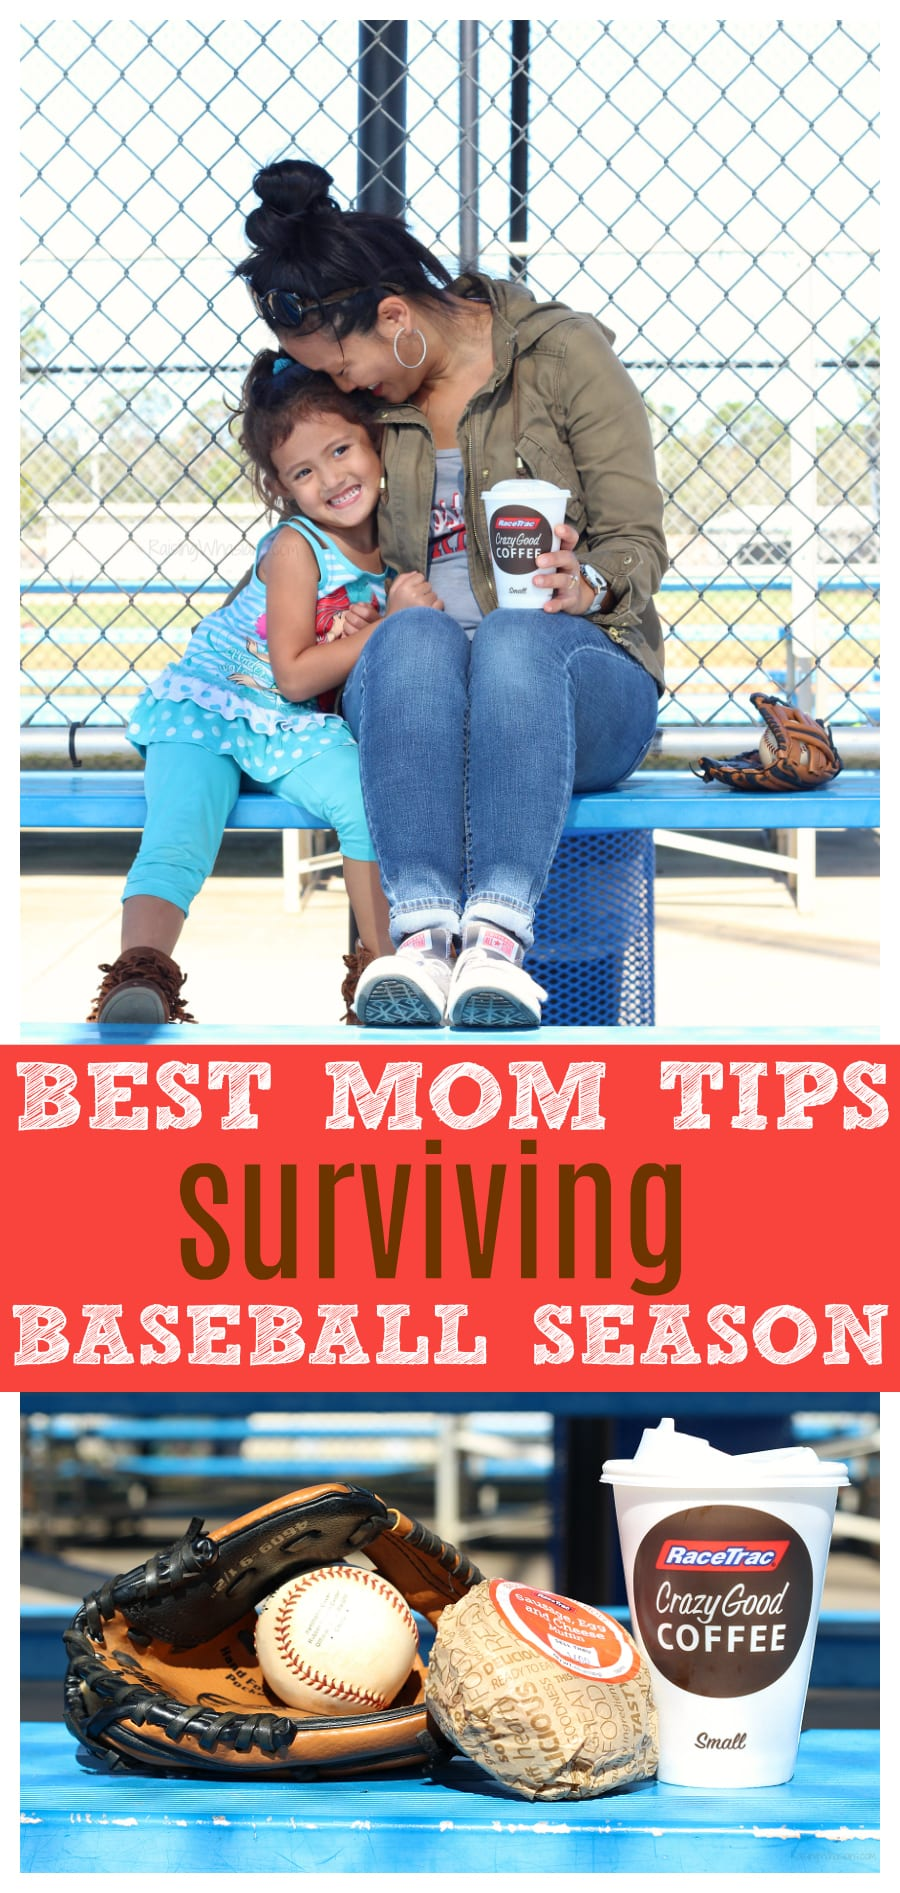 Best tips surviving baseball season